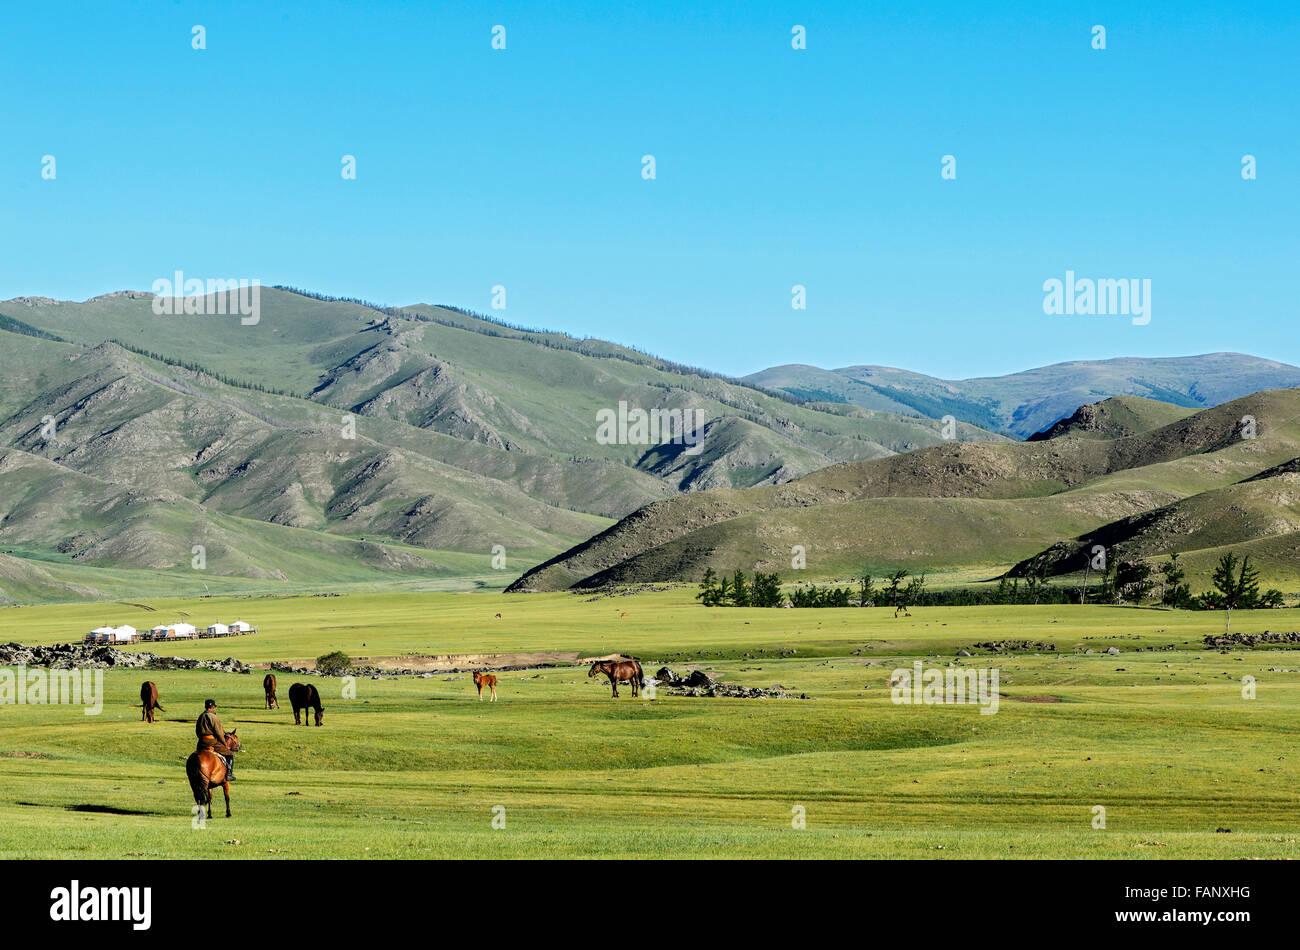 Nomadi nel paesaggio arido nella valle dell'Orkhon, Khangai Nuruu National Park, Övörkhangai Aimag, Immagini Stock